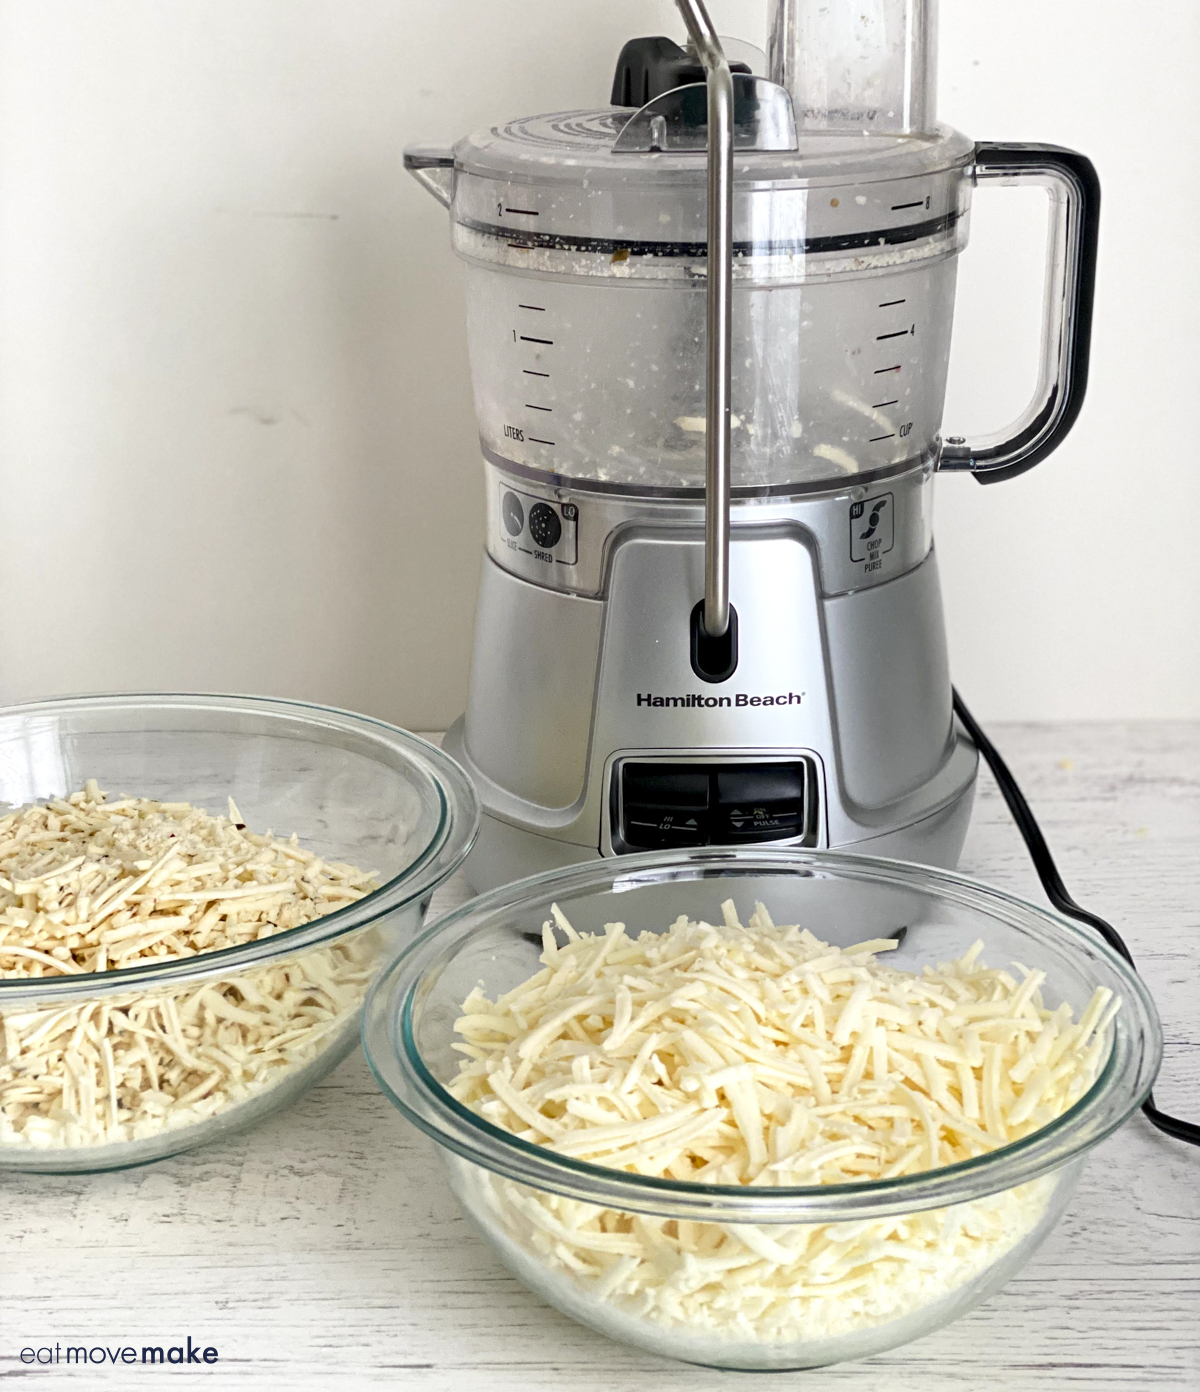 Hamilton Beach food processor with shredded cheese